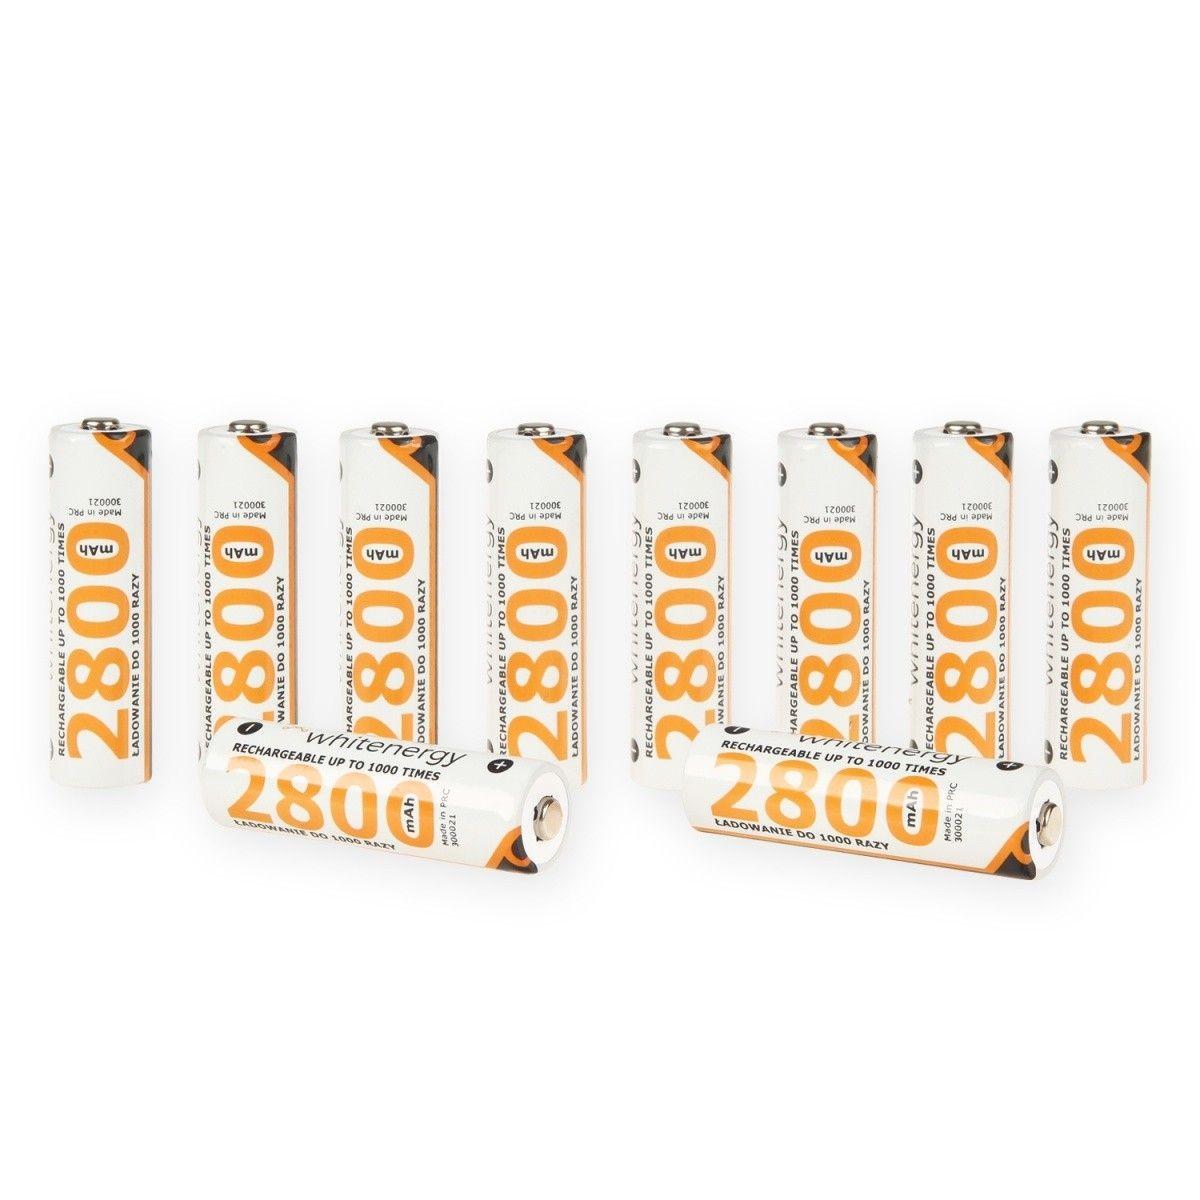 Whitenergy akumulatory - baterie AA/R6 2800mAh 10szt - blister